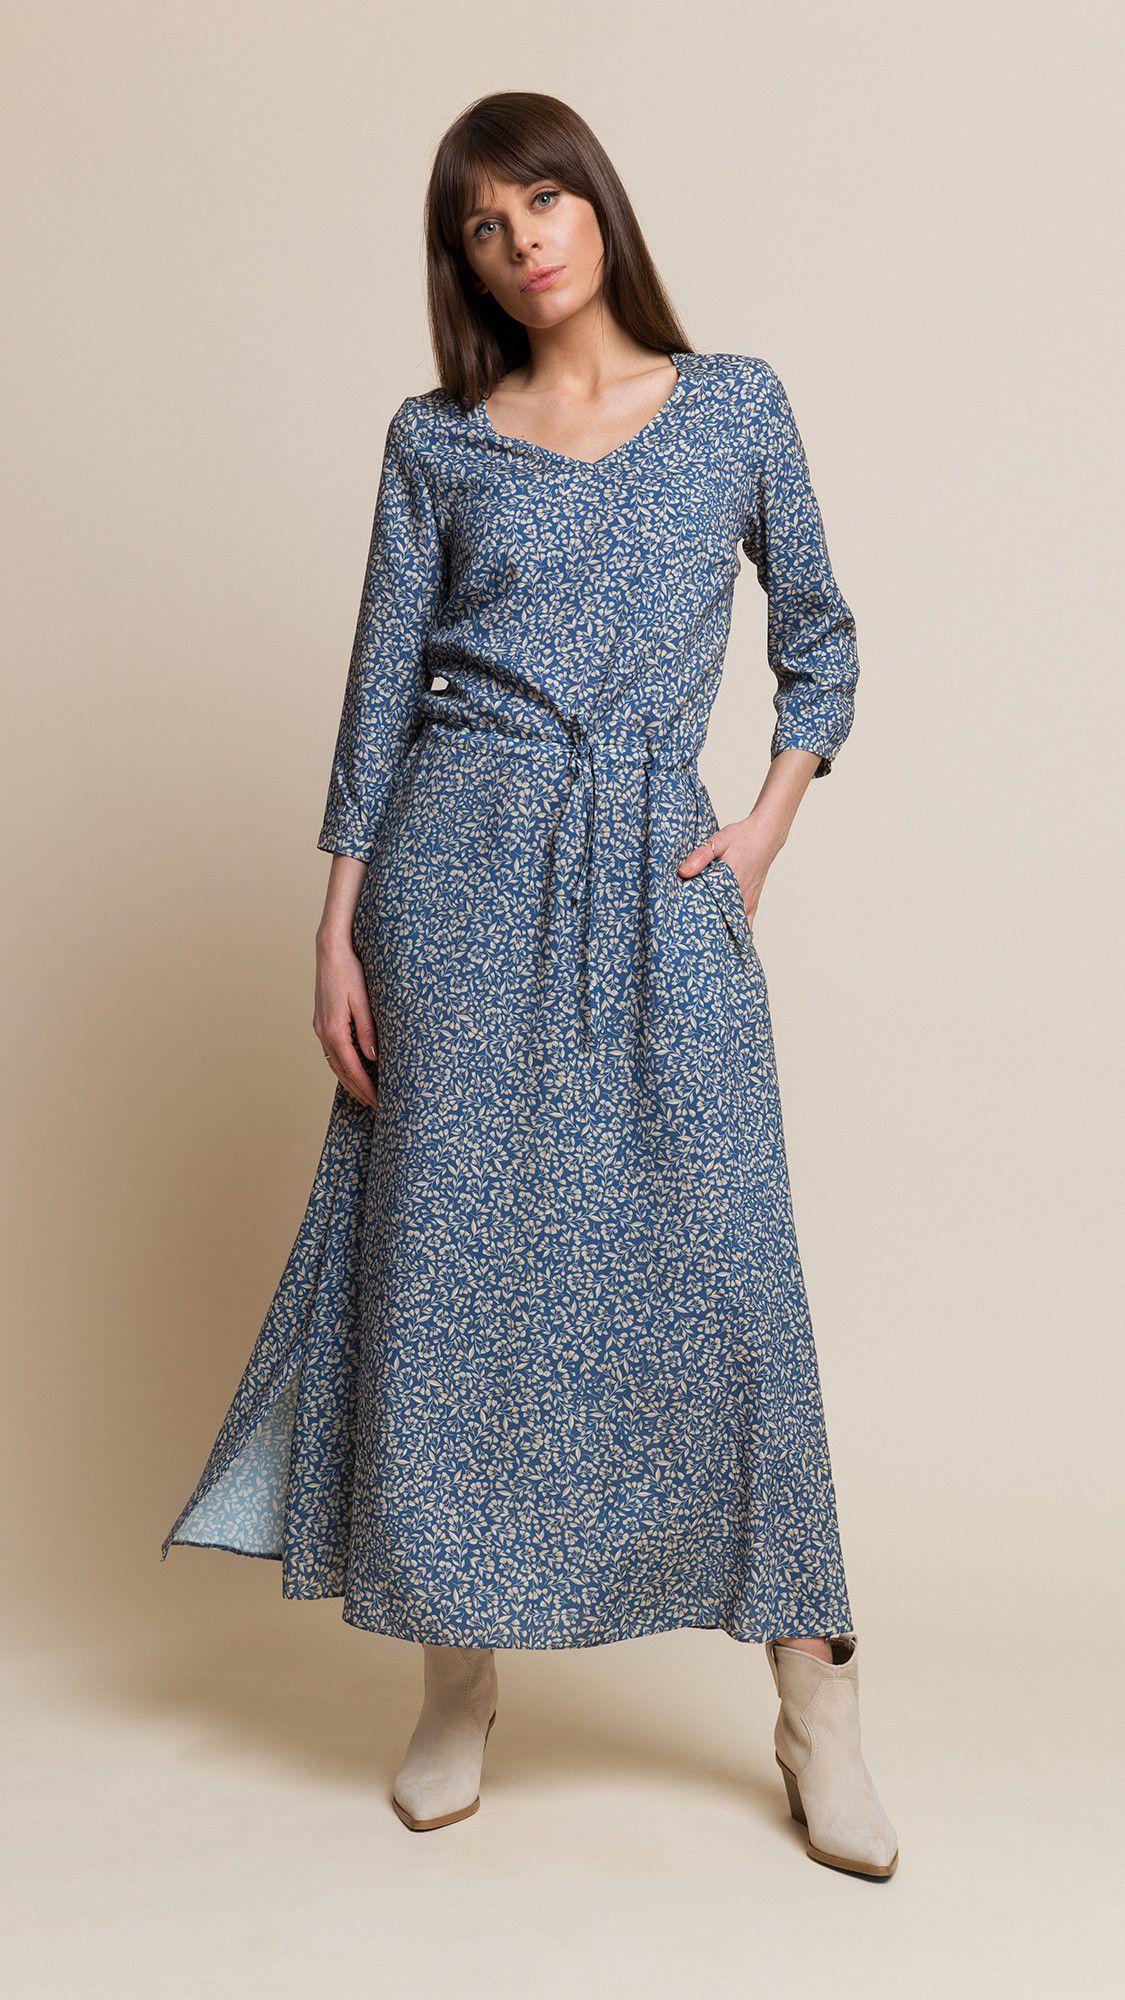 Dress Nancy Floral Blue